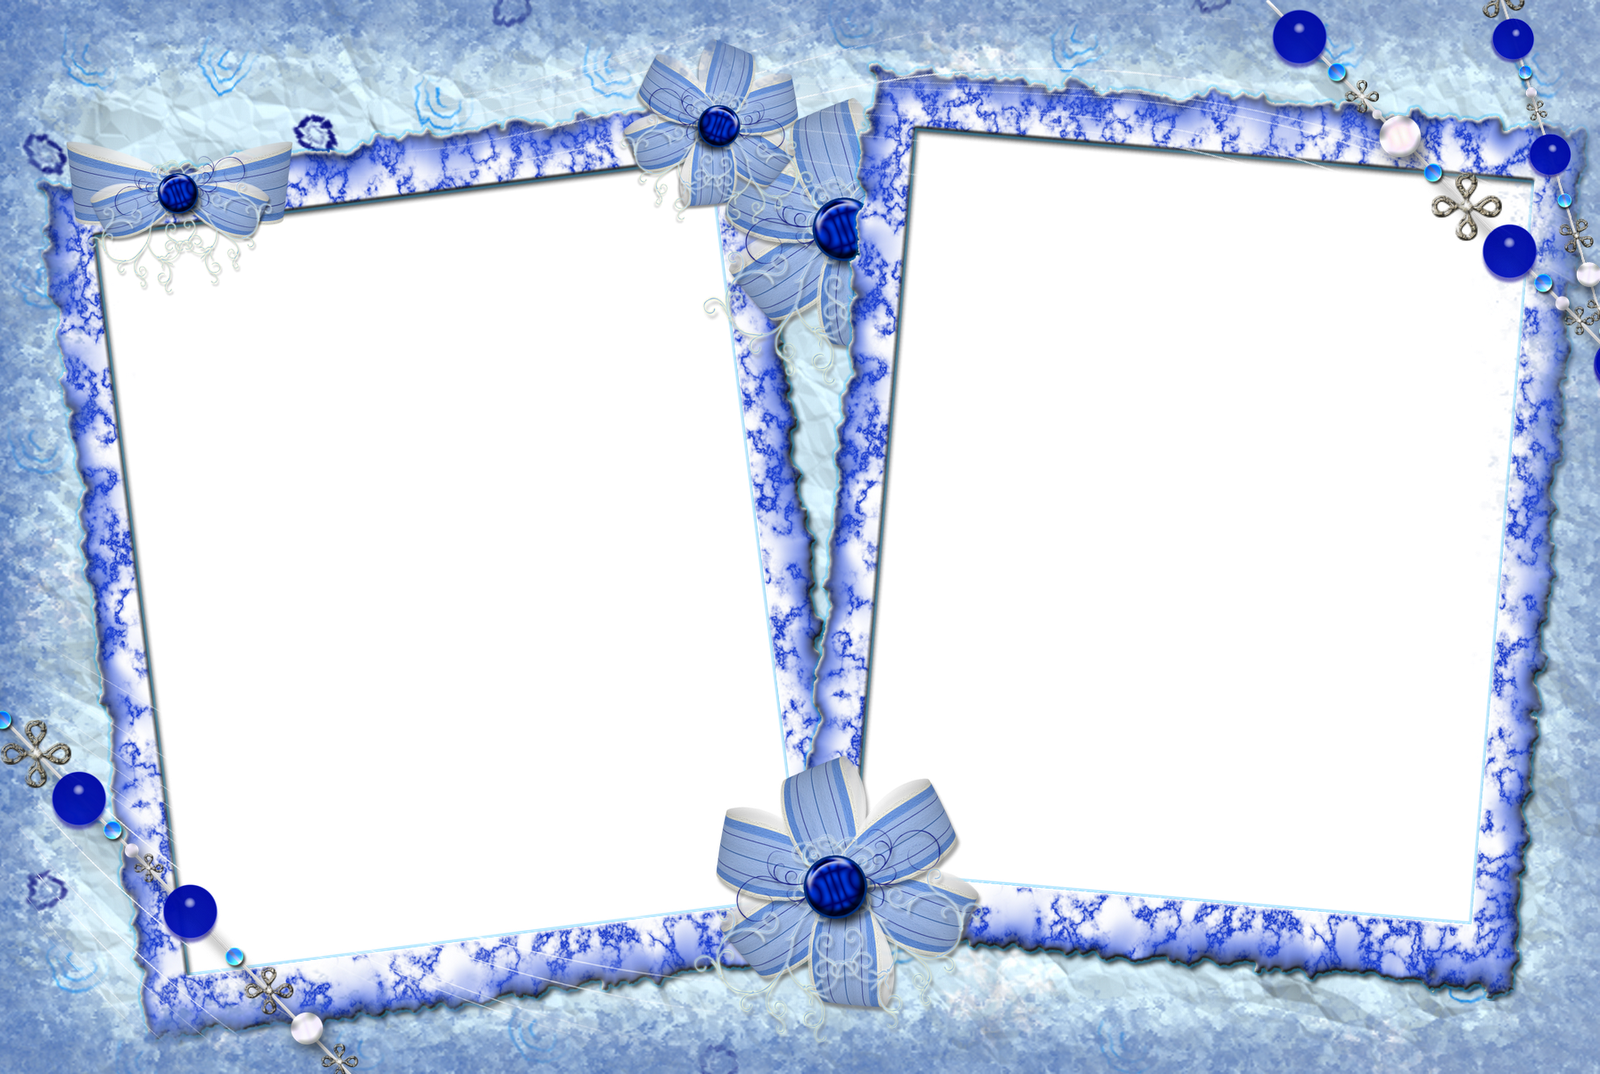 Зимняя рамка для фотографии